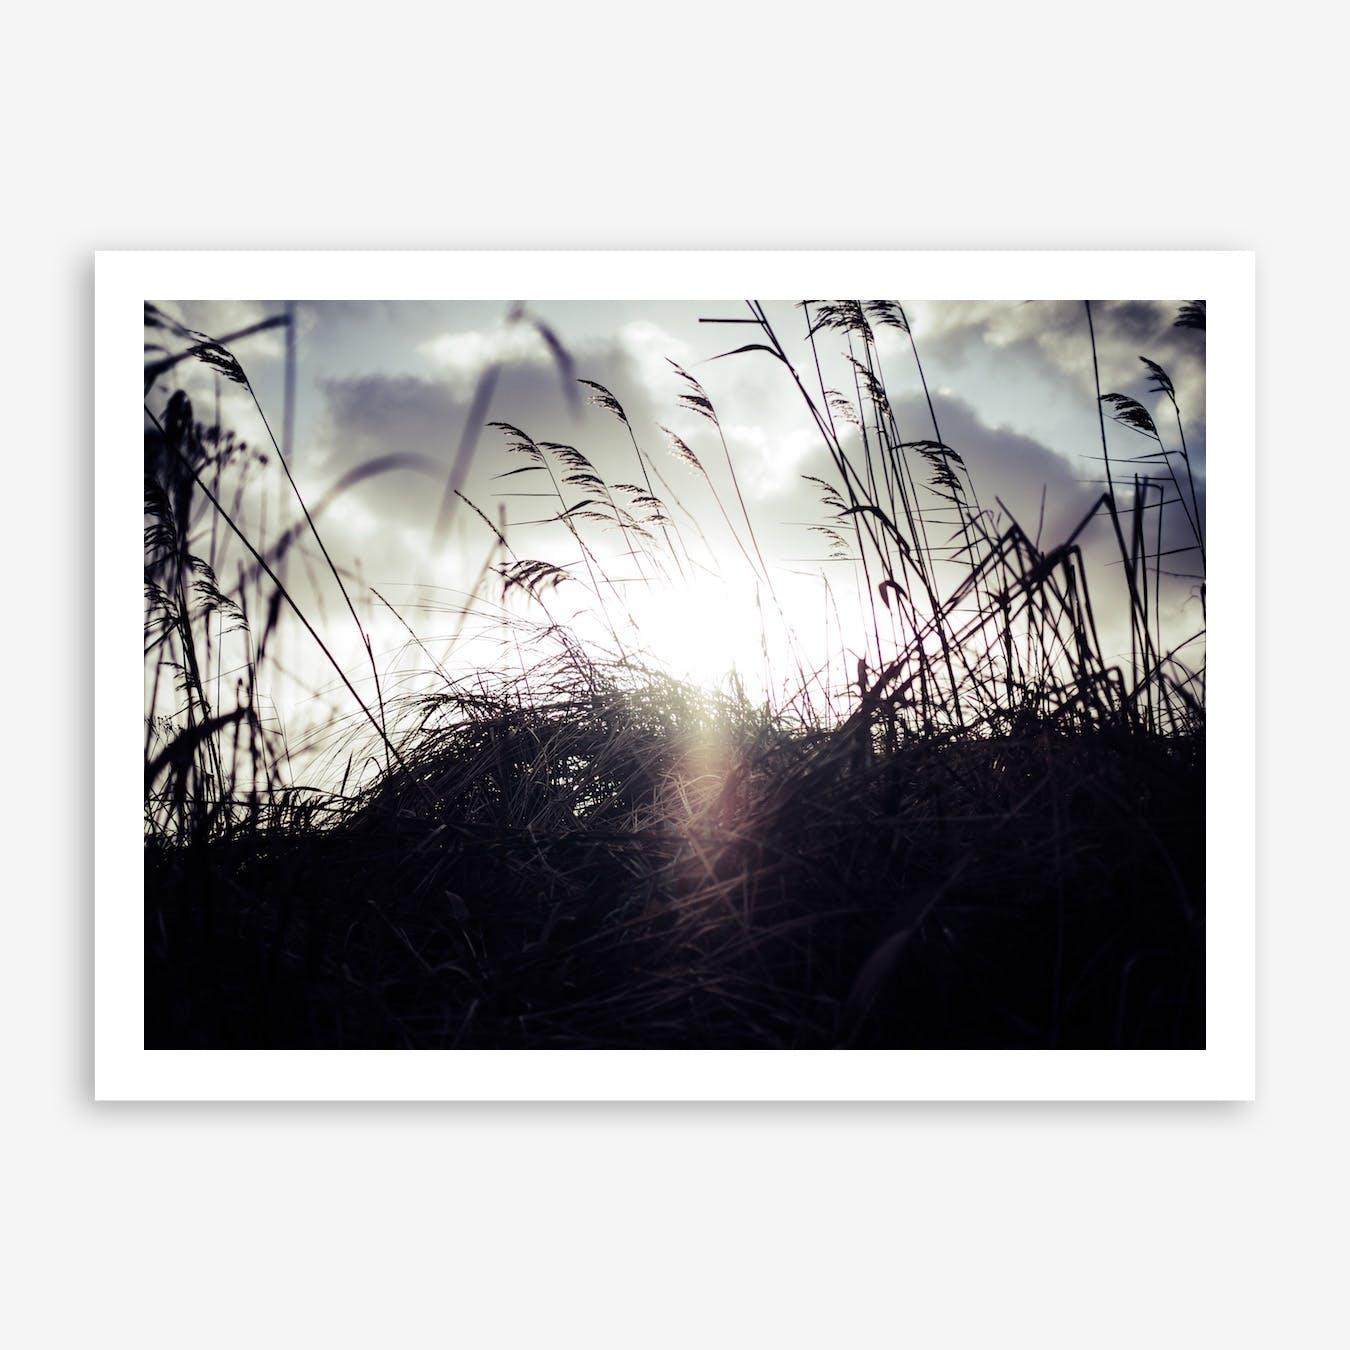 Reeds on the Beach 3